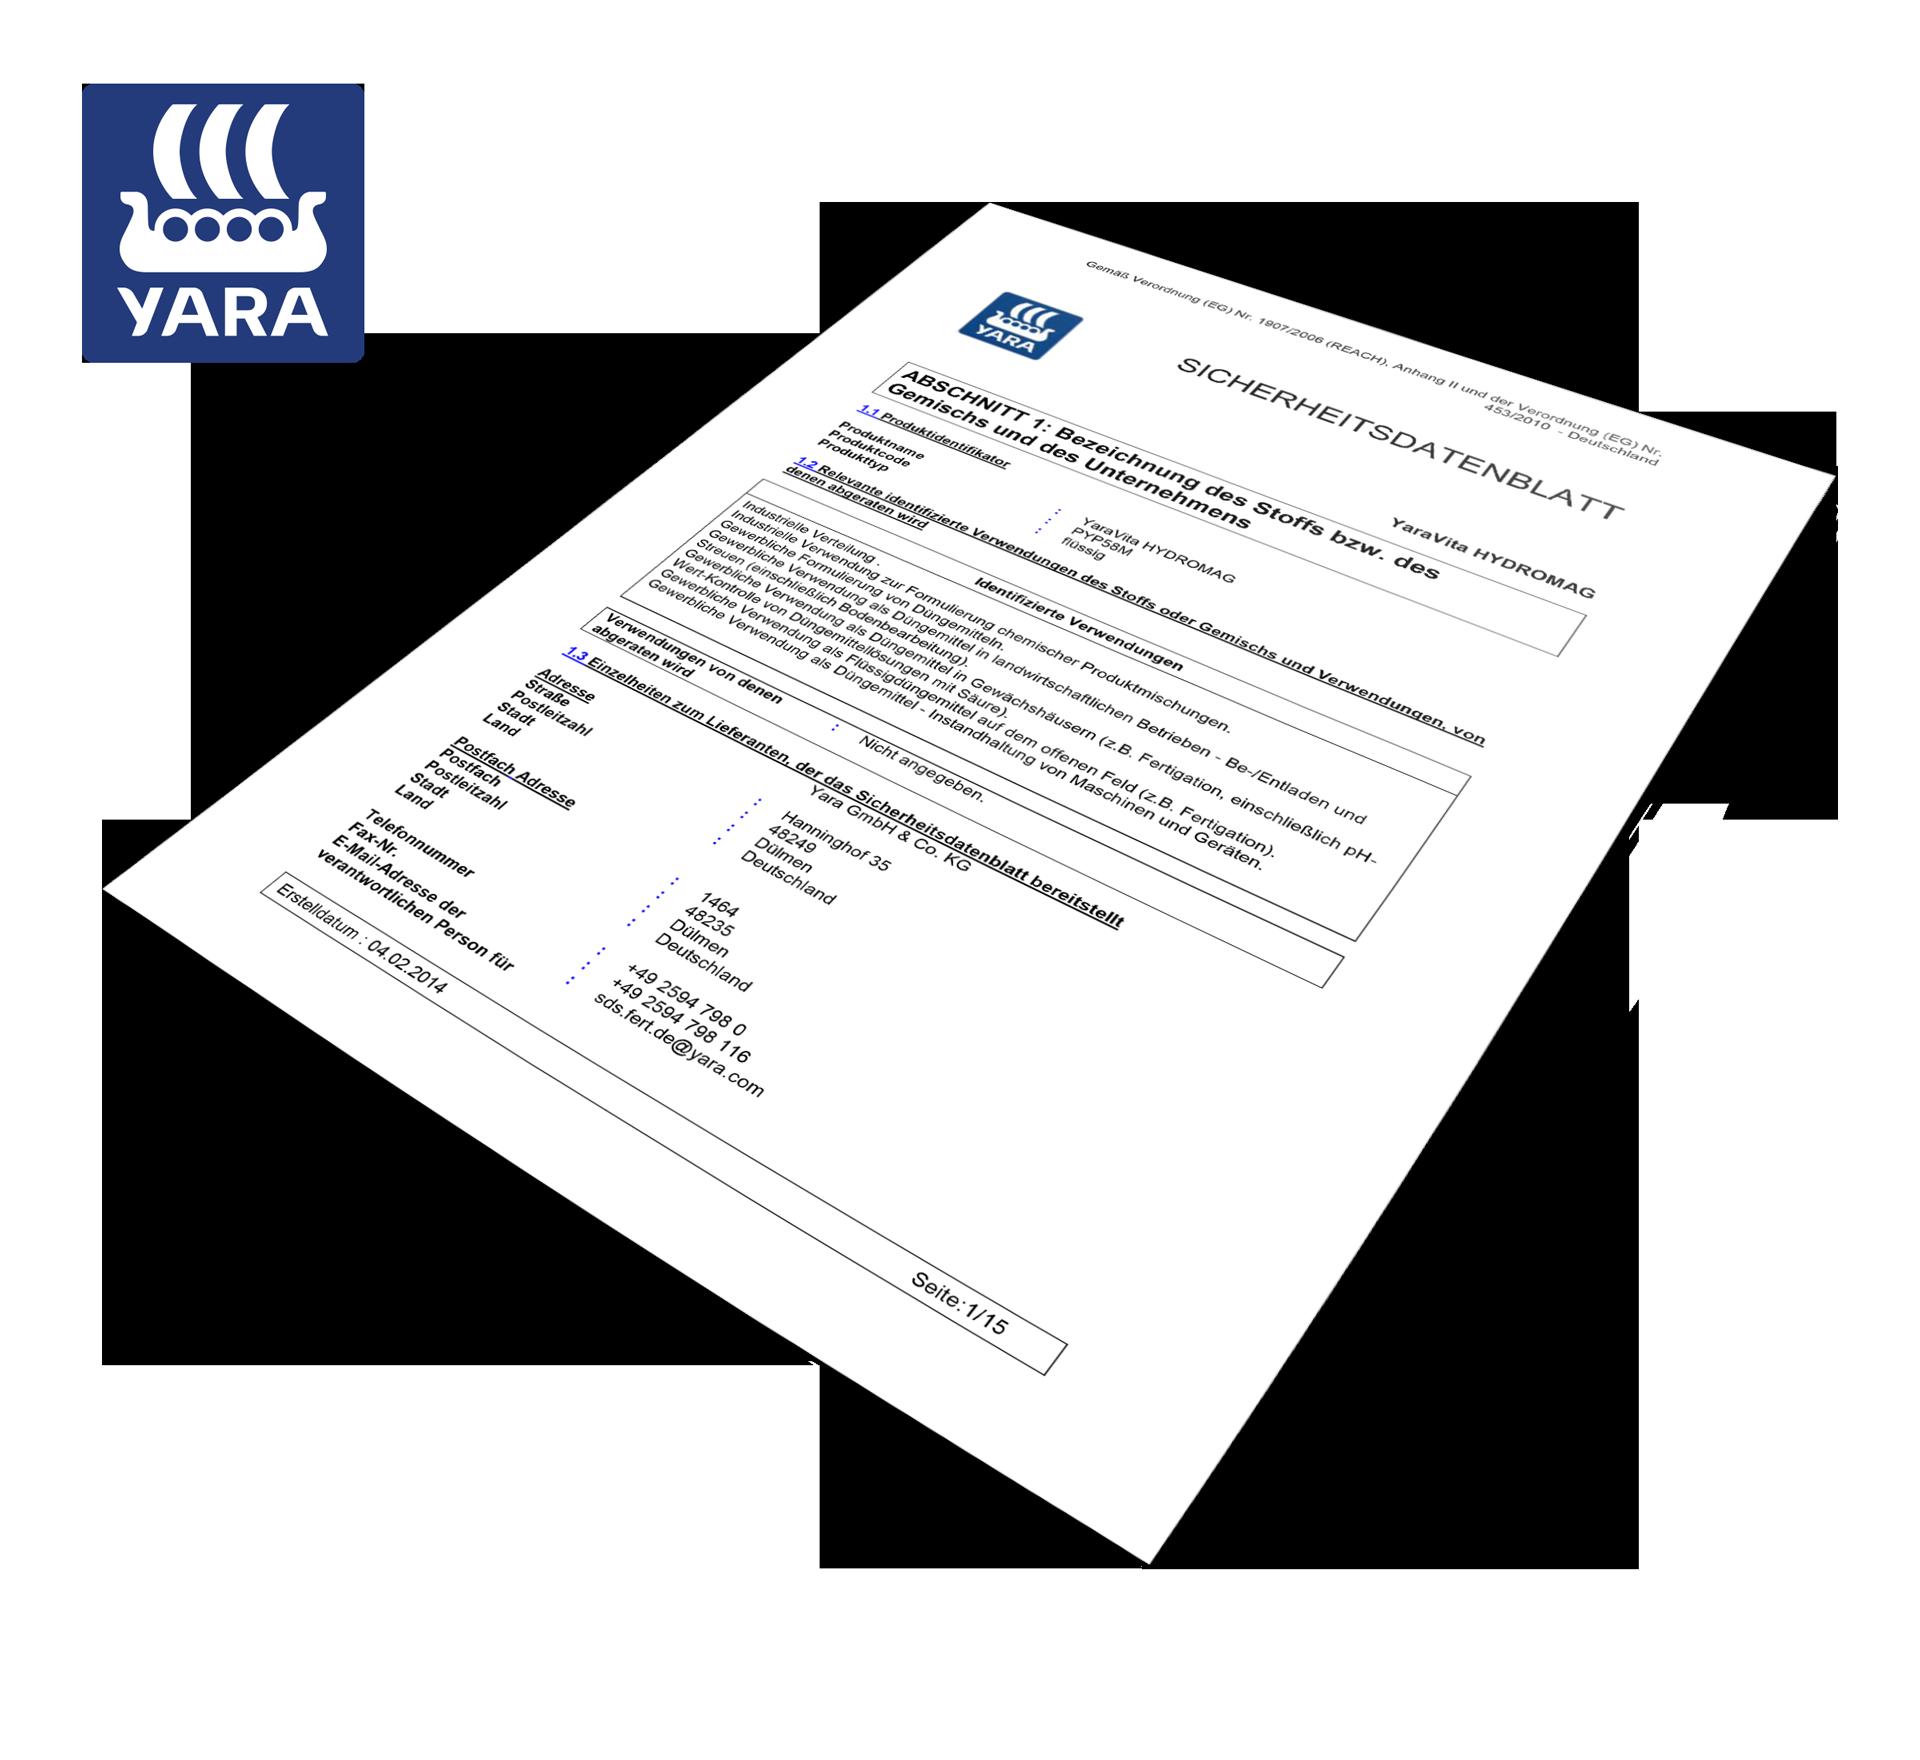 Yara_vita_Hydromag_Sicherheitsdatenblatt